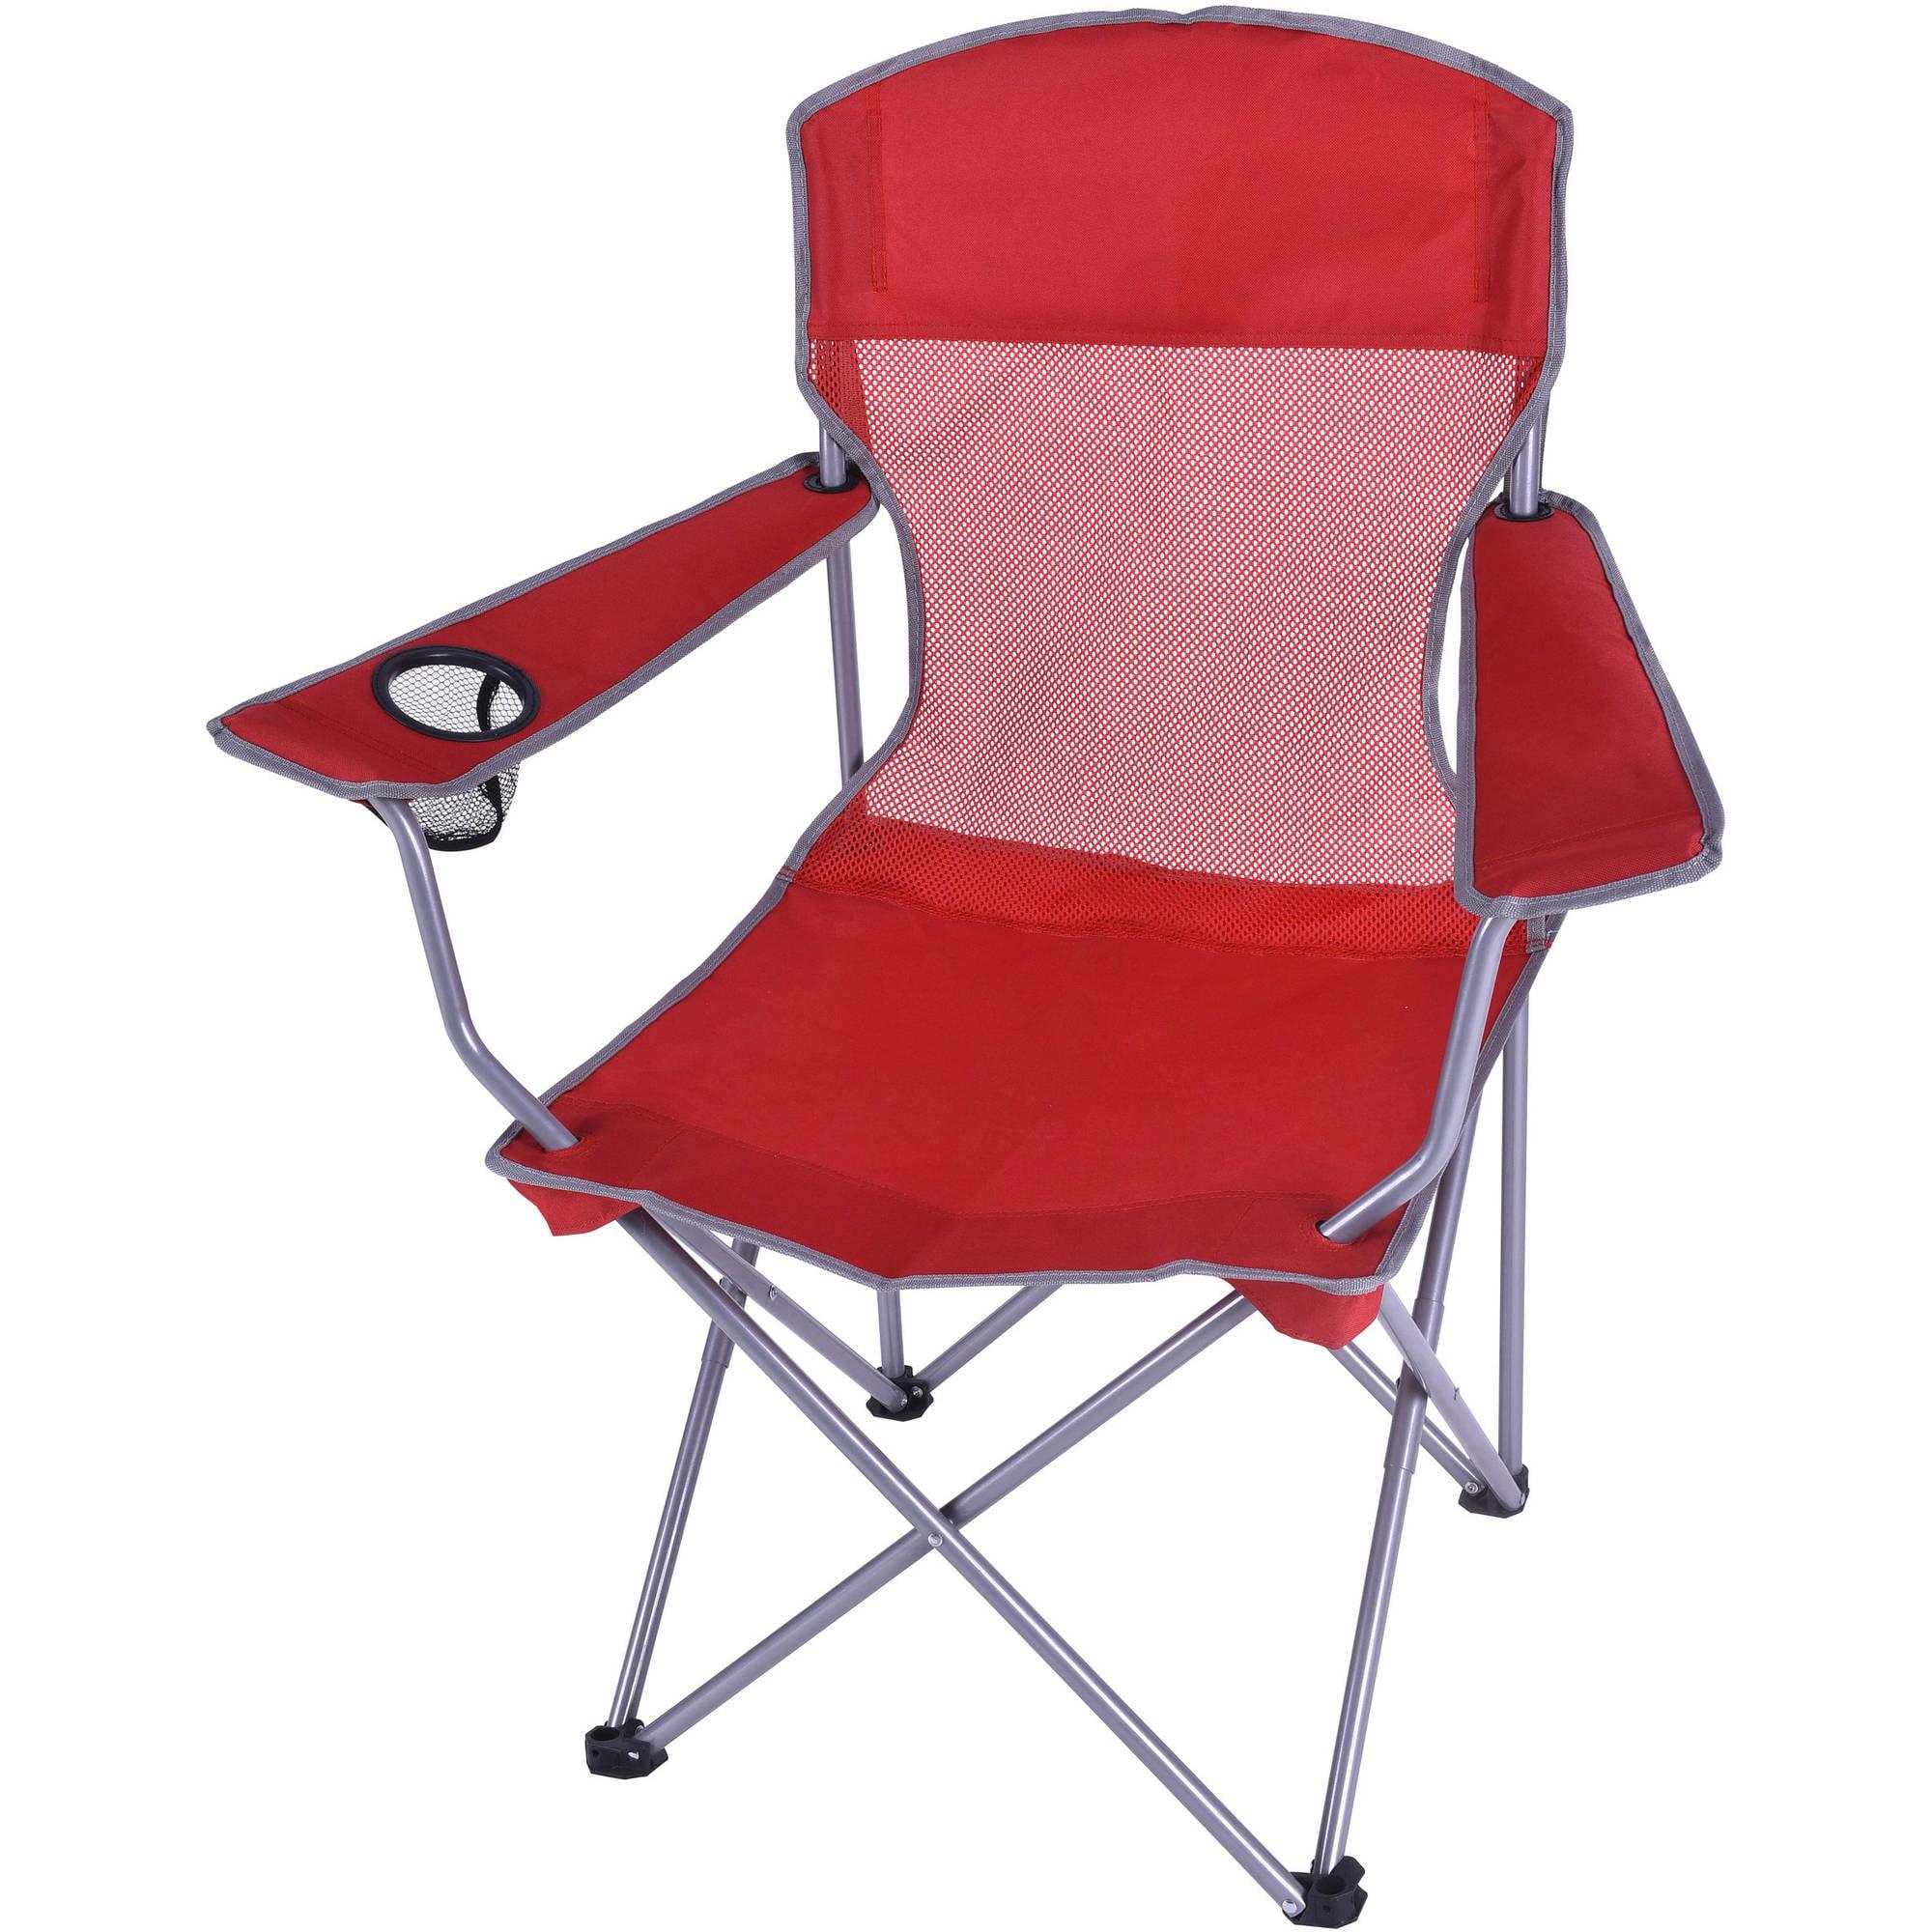 Remarkable Ozark Trail Basic Mesh Chair On Popscreen Theyellowbook Wood Chair Design Ideas Theyellowbookinfo